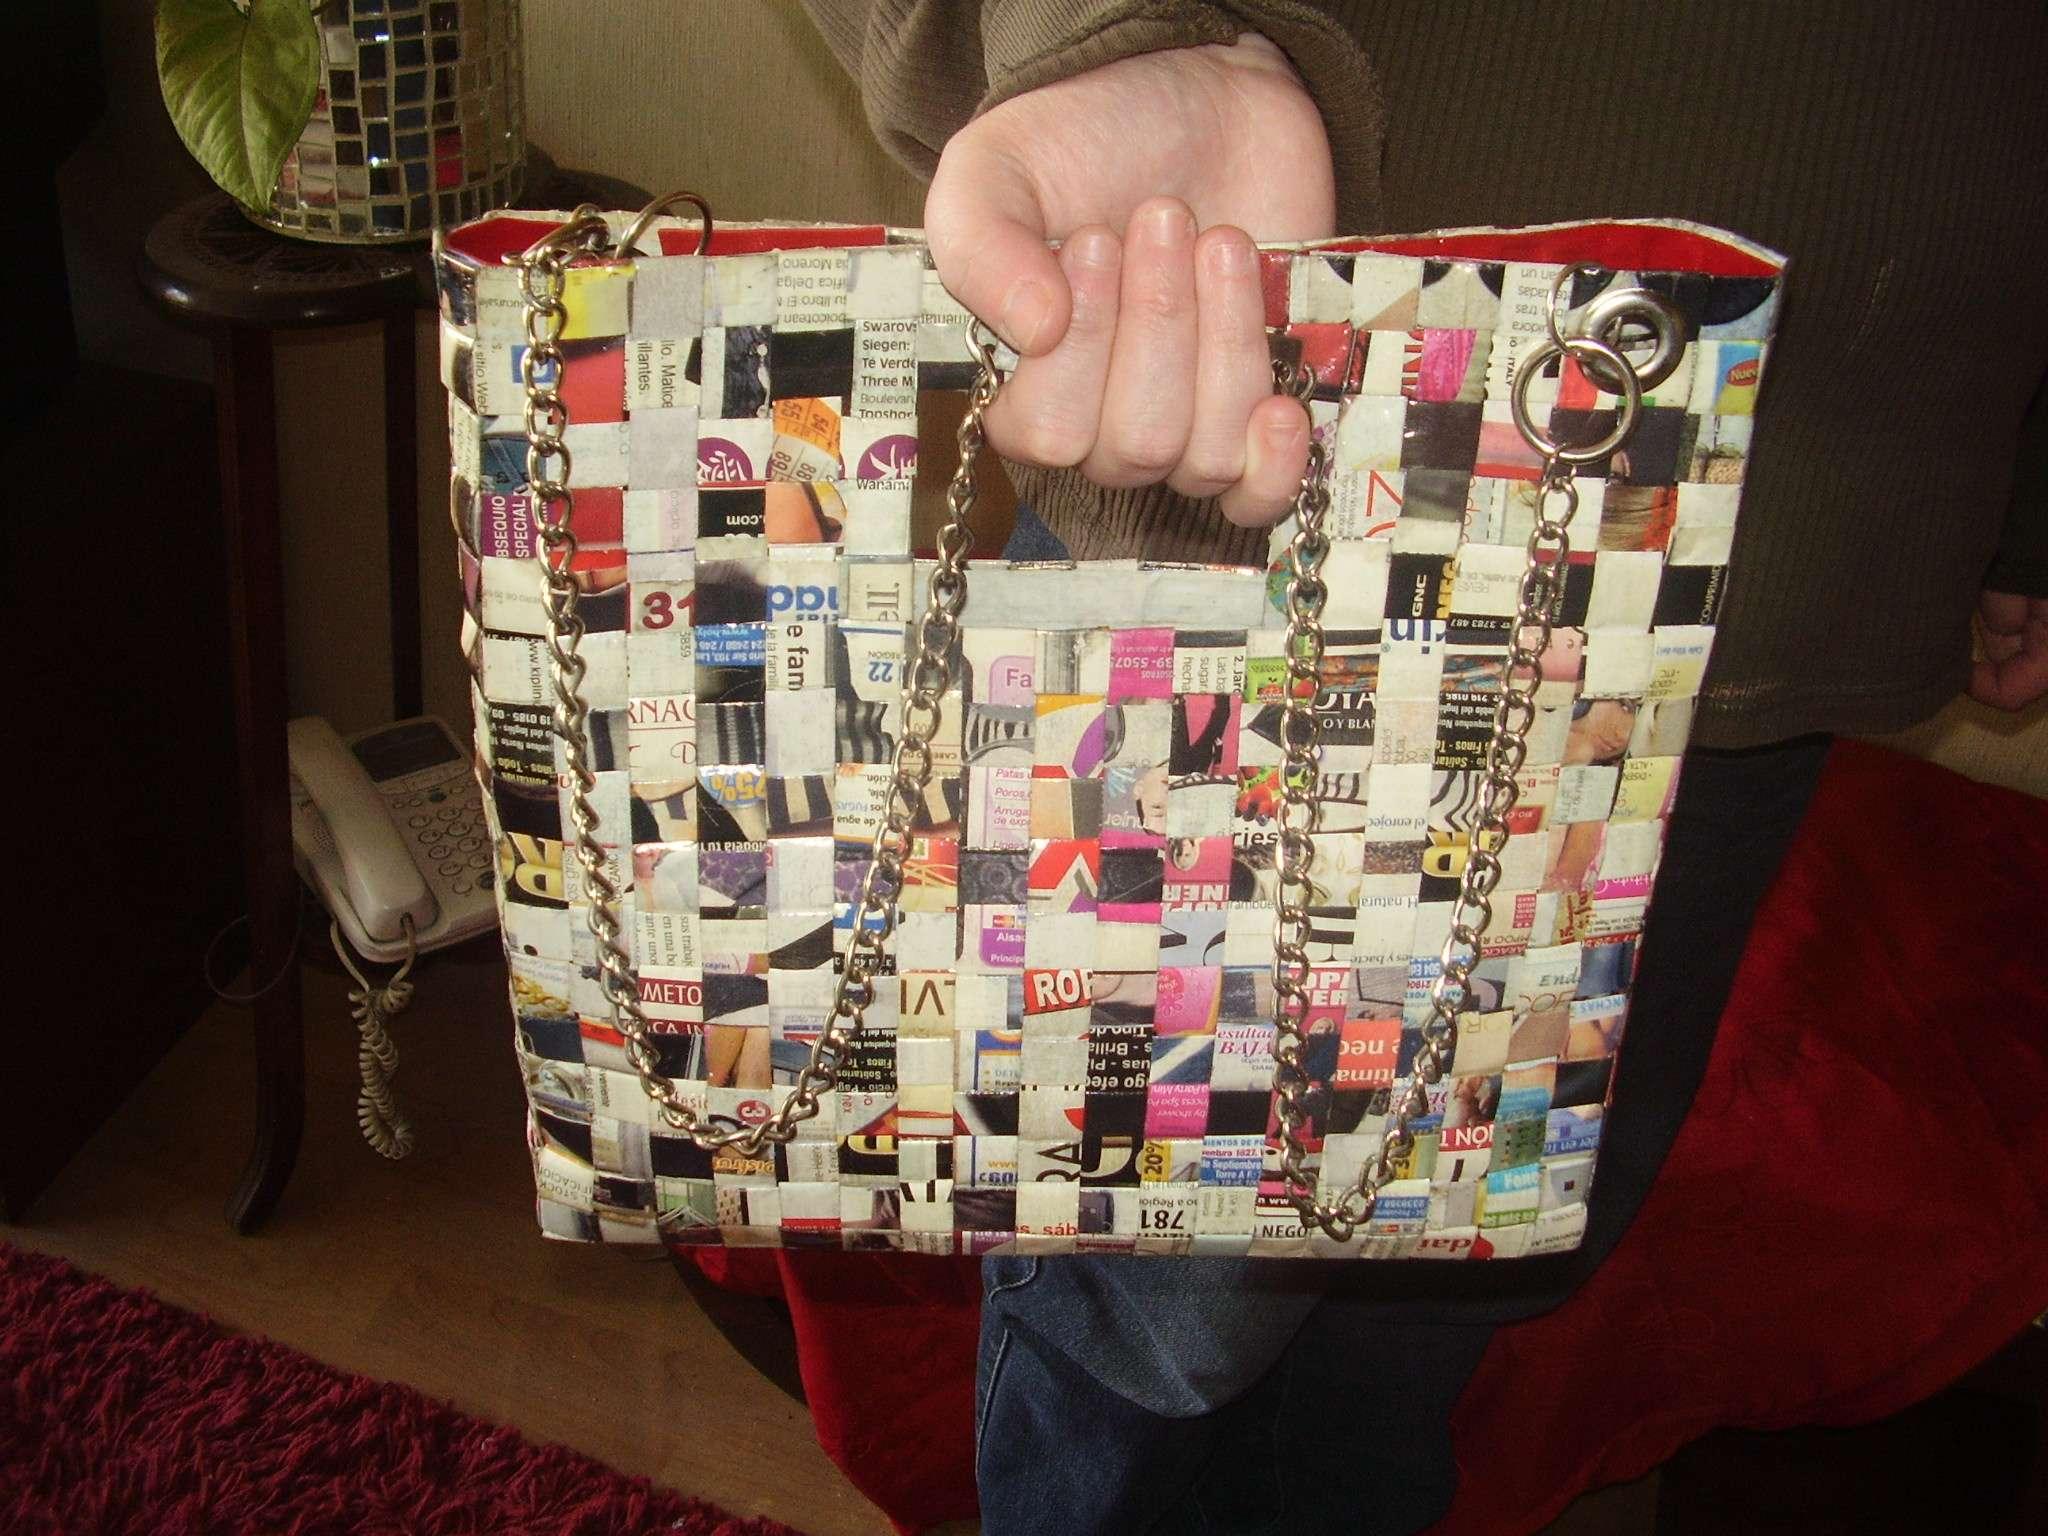 Carteras de papel reciclado - Estás de Moda: Revista de moda para